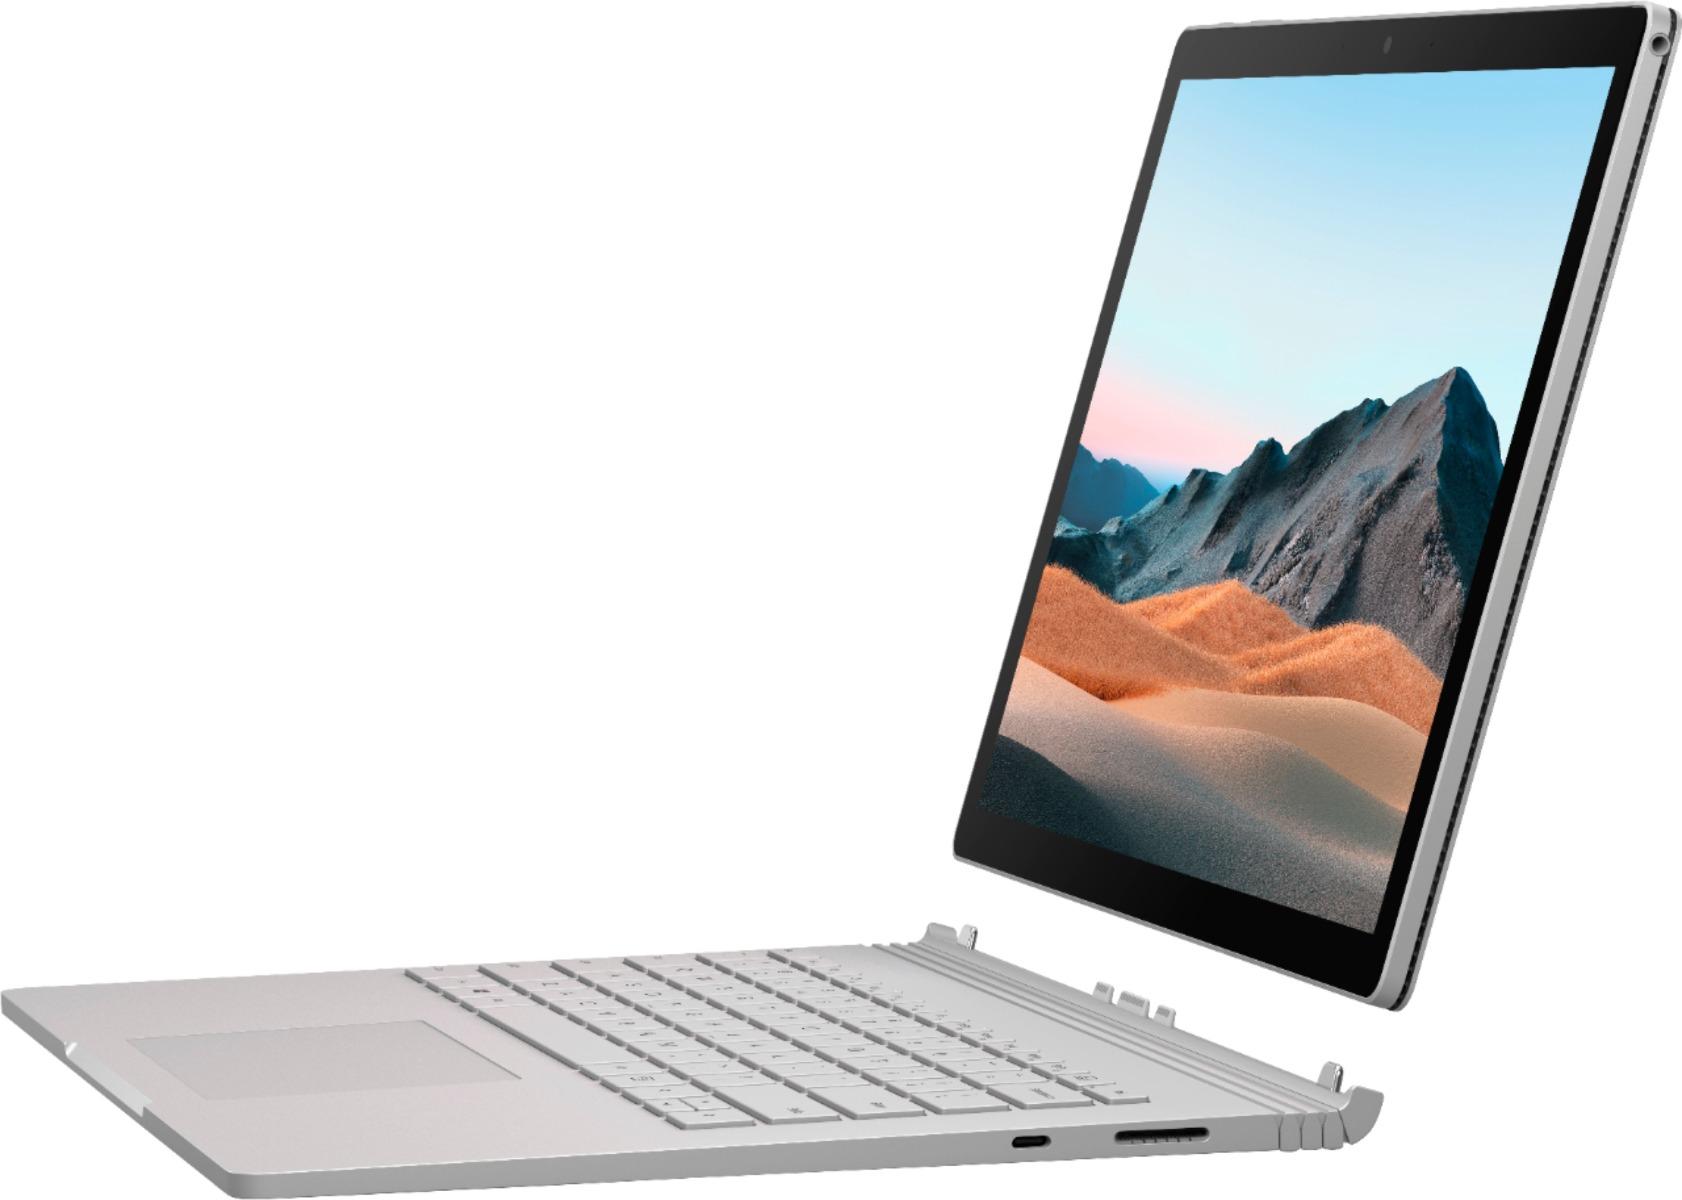 Microsoft - Surface Book 3 13.5